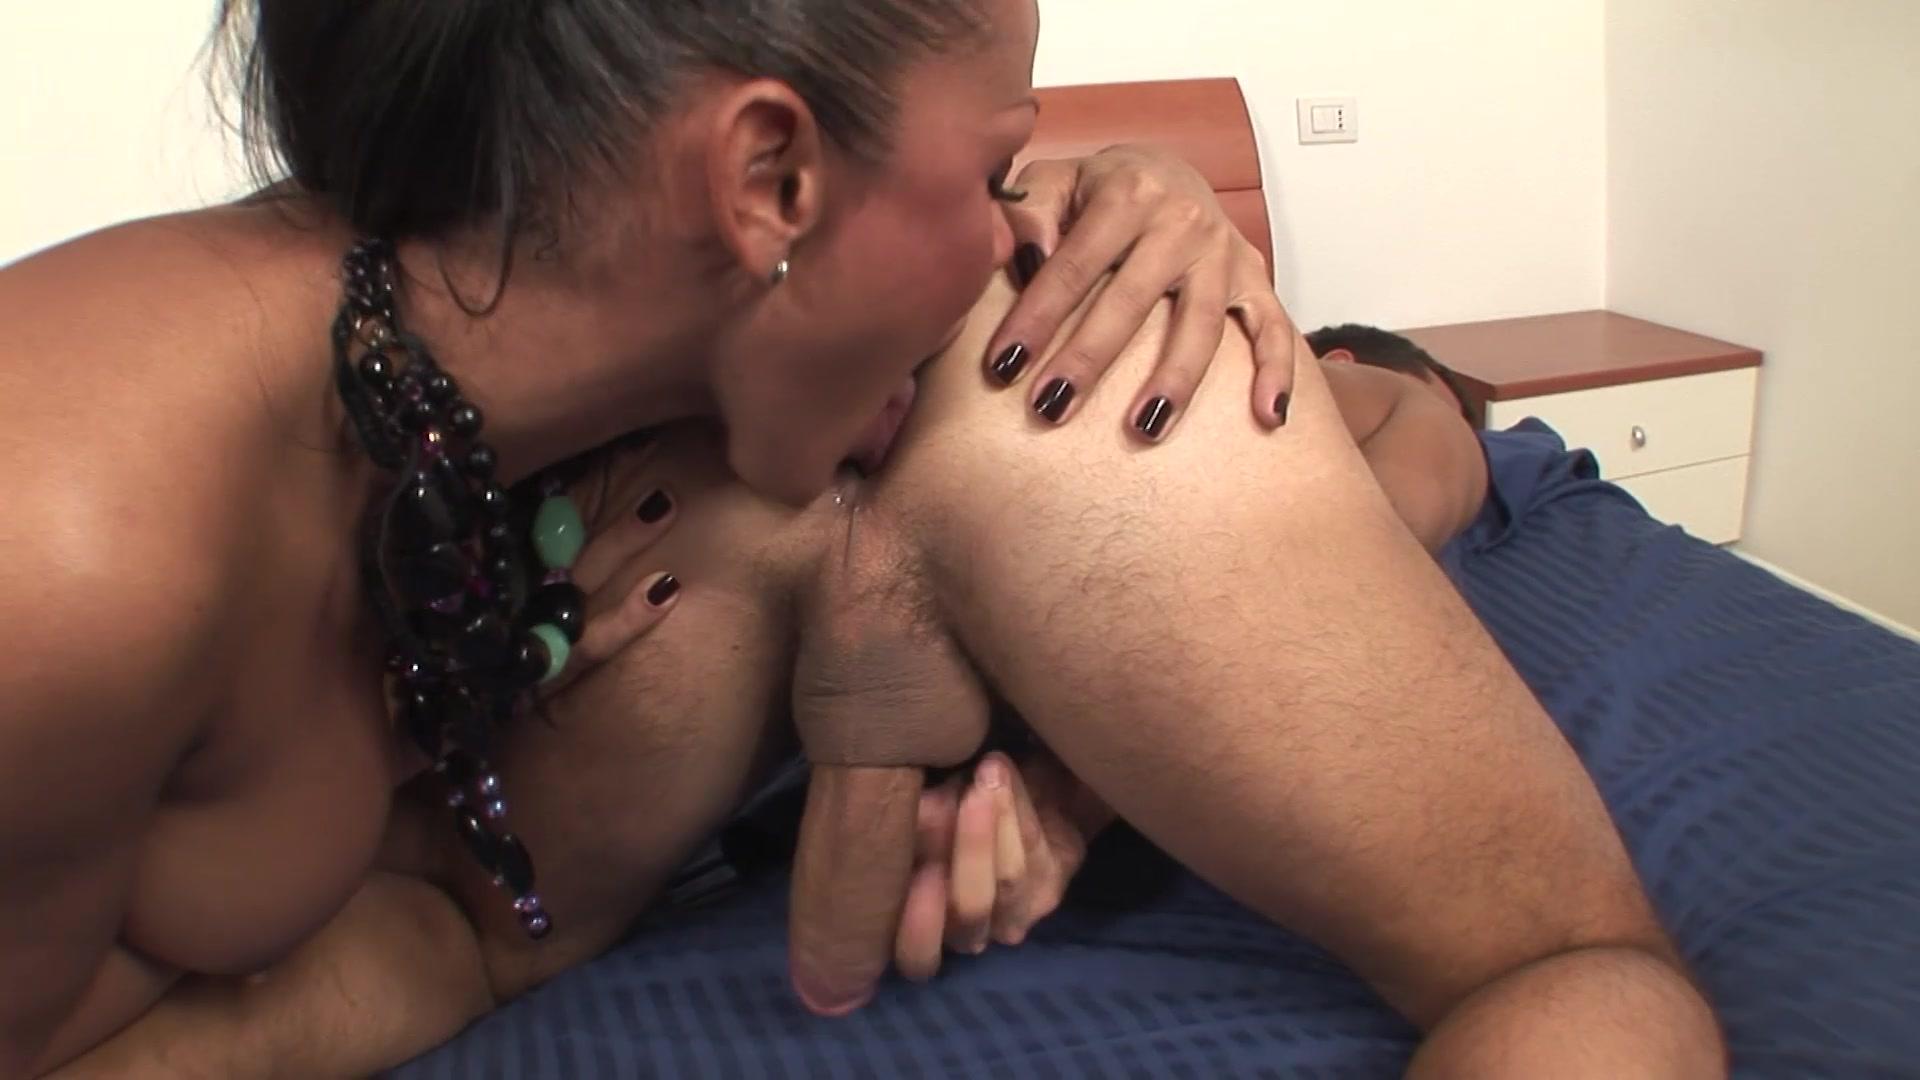 Watch Busty Ts Latina Enjoys Sucking And Riding Bfs Big Cock